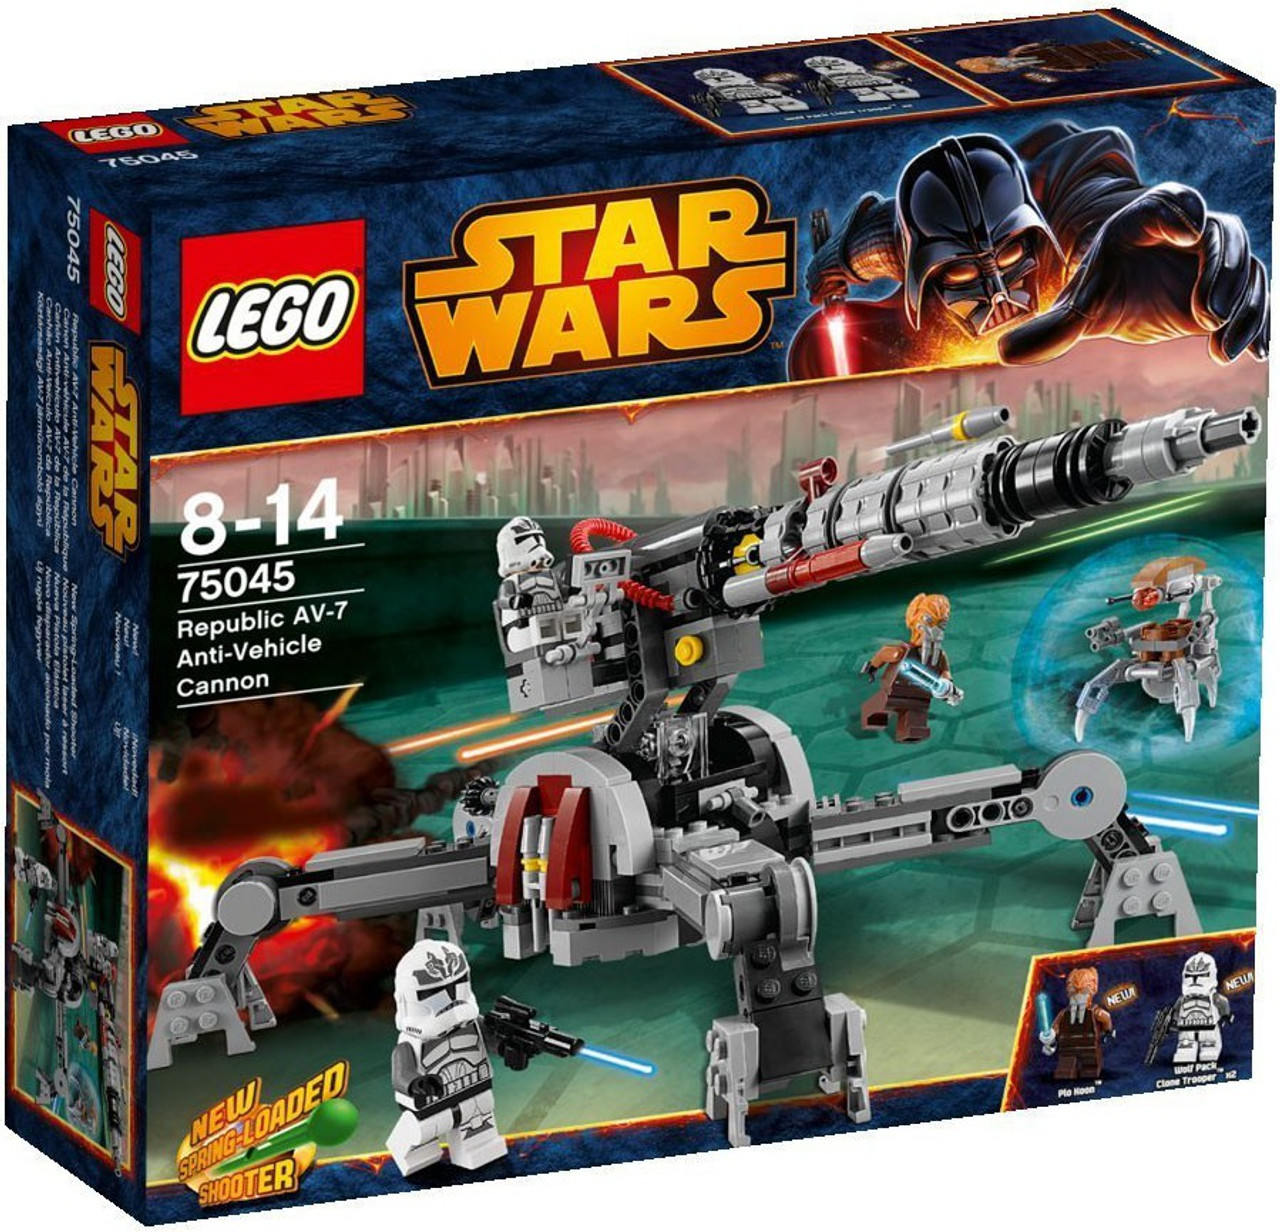 LEGO Star Wars The Clone Wars Republic AV-7 Anti-Vehicle Cannon Set #75045